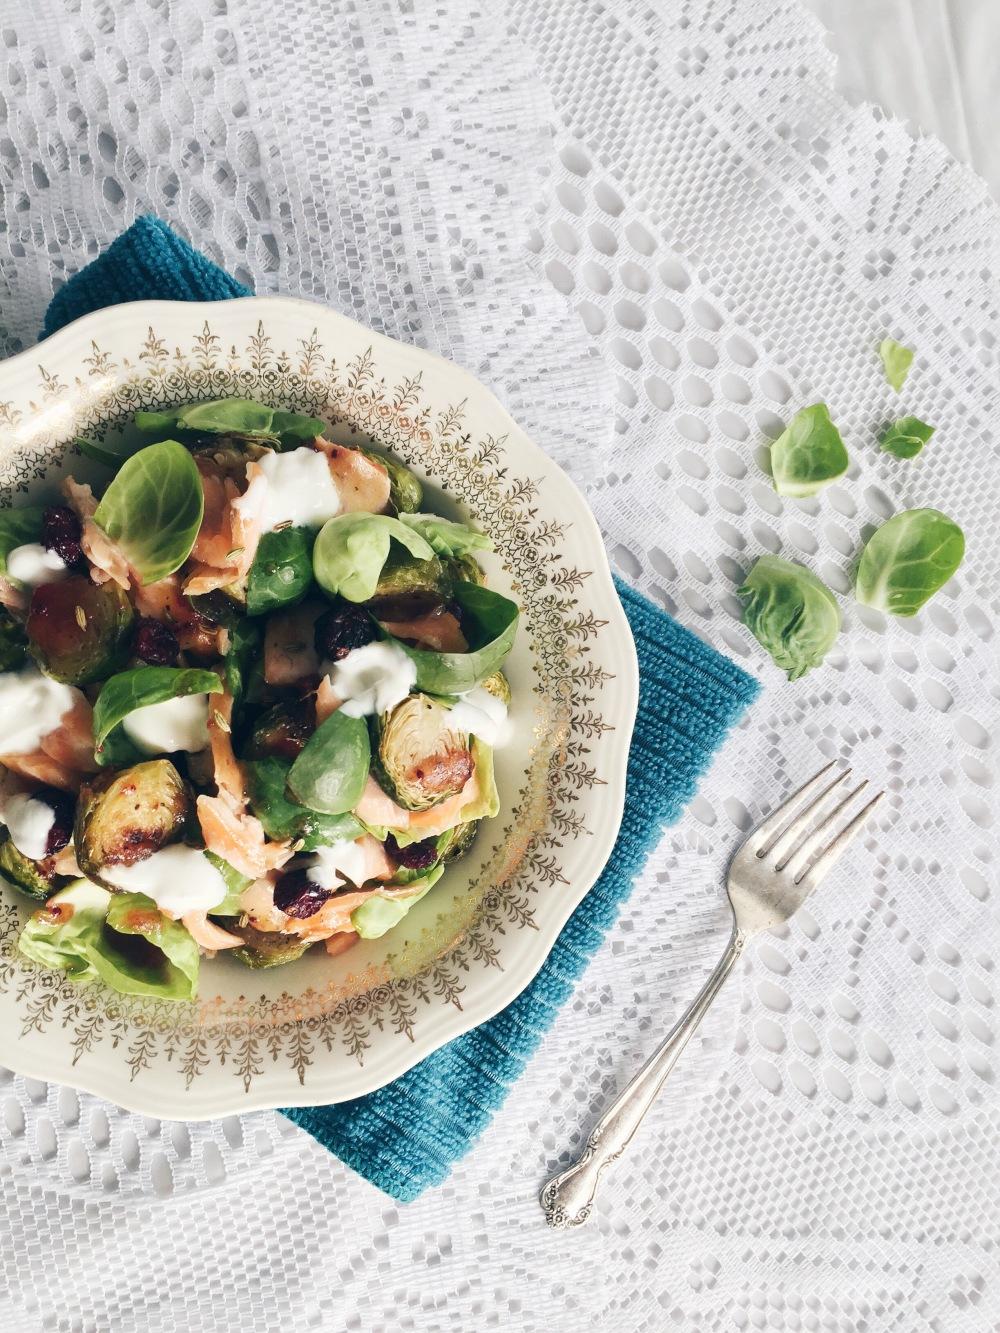 salade-chou-bruxelle-saumon